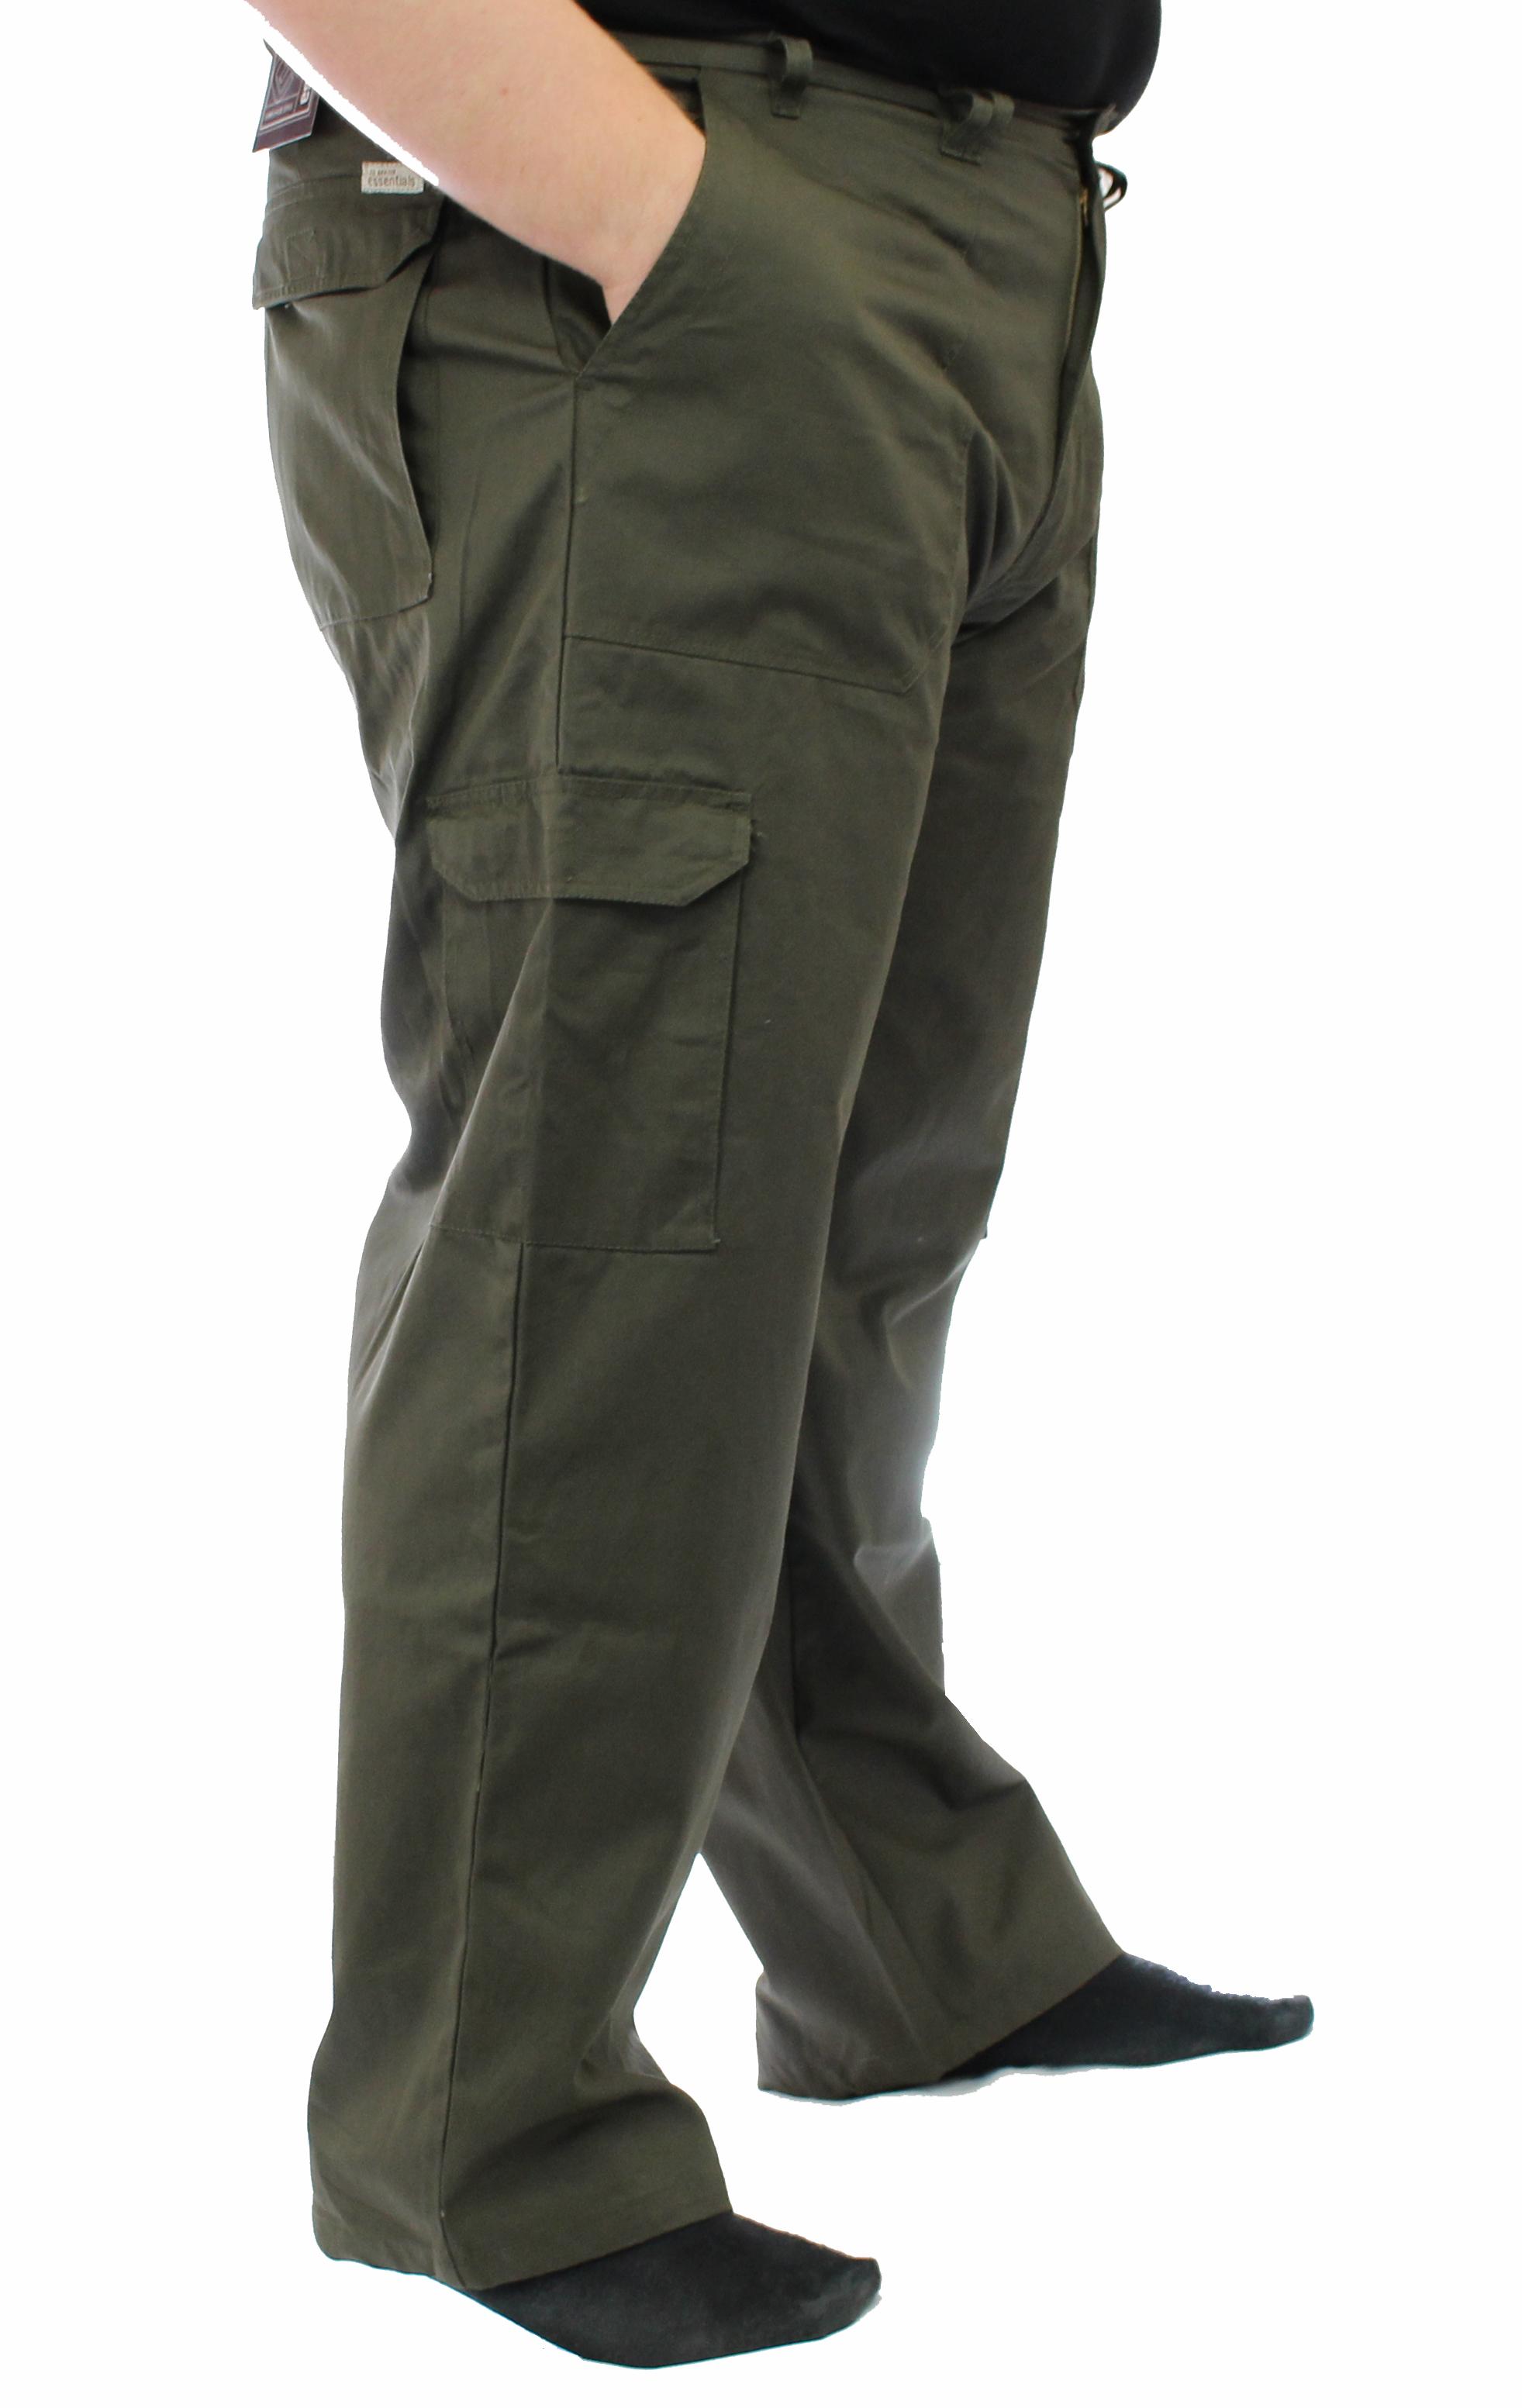 "Ed Baxter Victory - Heavy Duty Cargo Combat Trousers - Khaki - 58"" Waist, 32"" Leg"